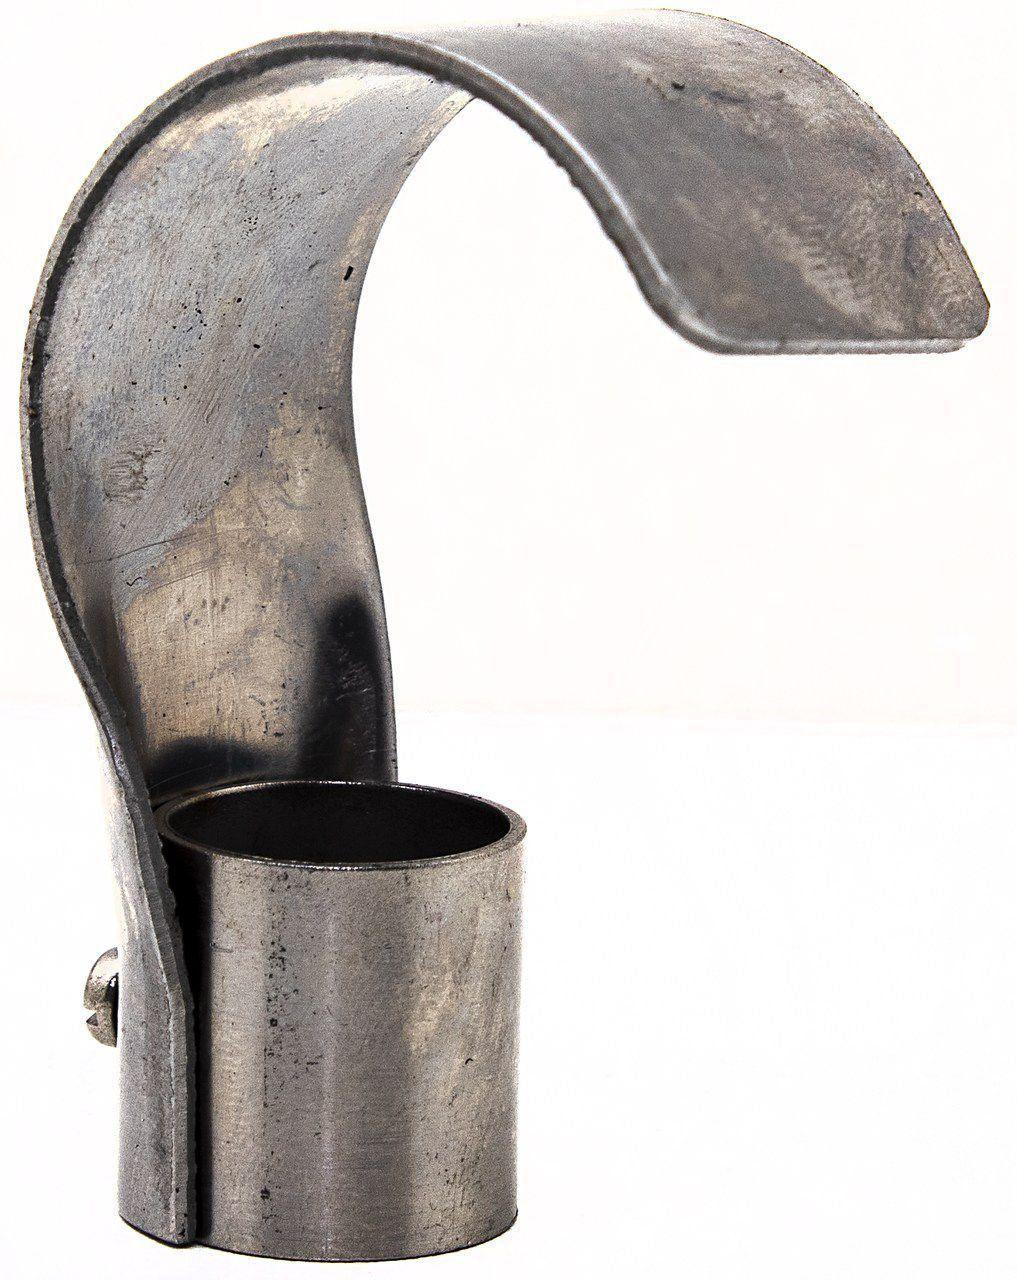 Ferramenta Protetor Chama Para Maçarico Bico Largo 950525